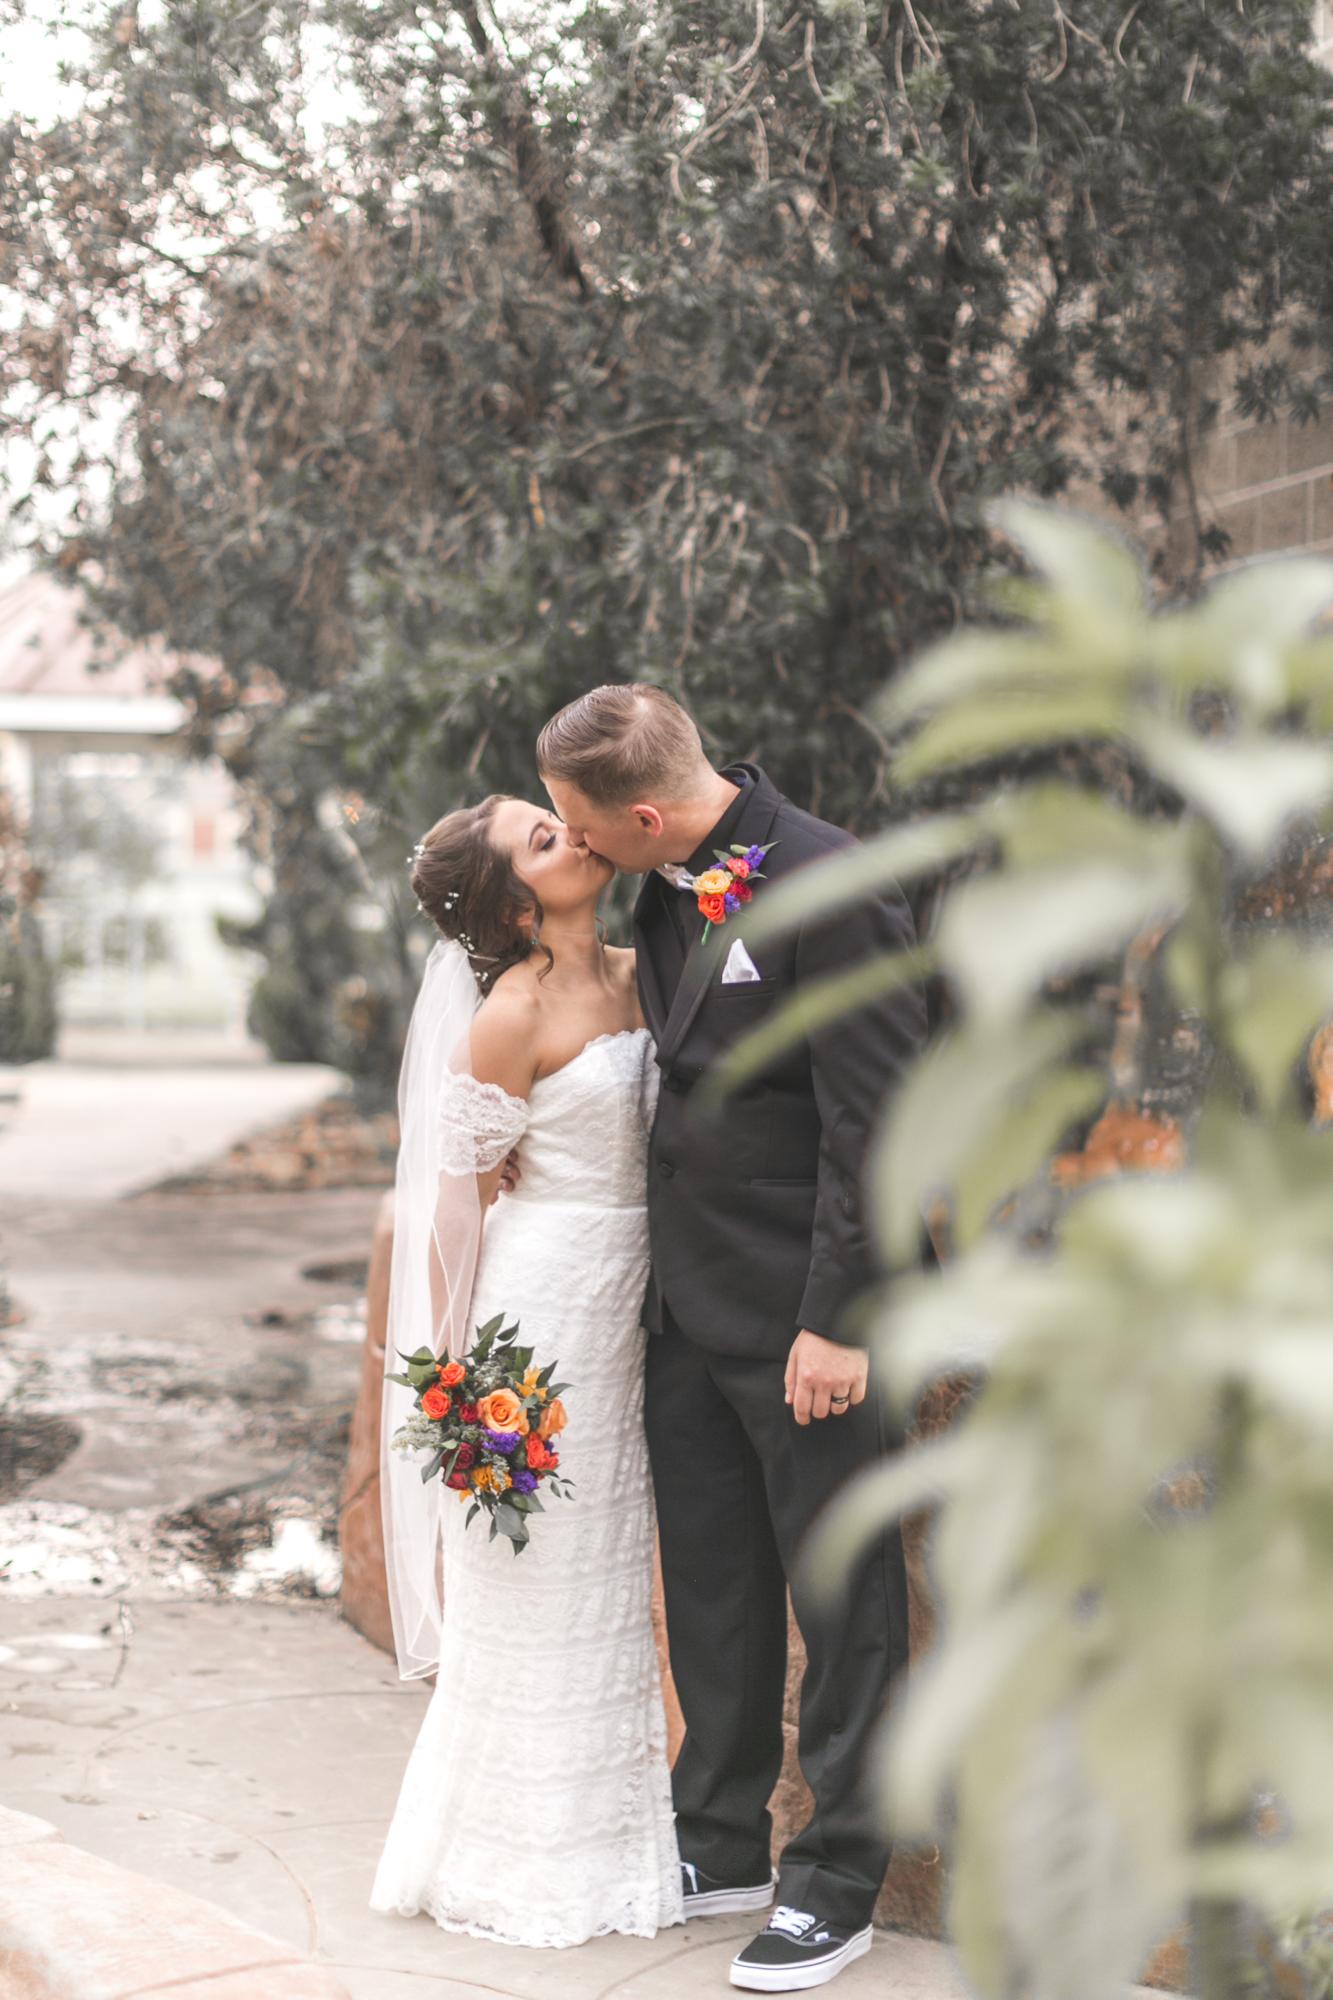 Seymour-Matte Wedding-8.jpg